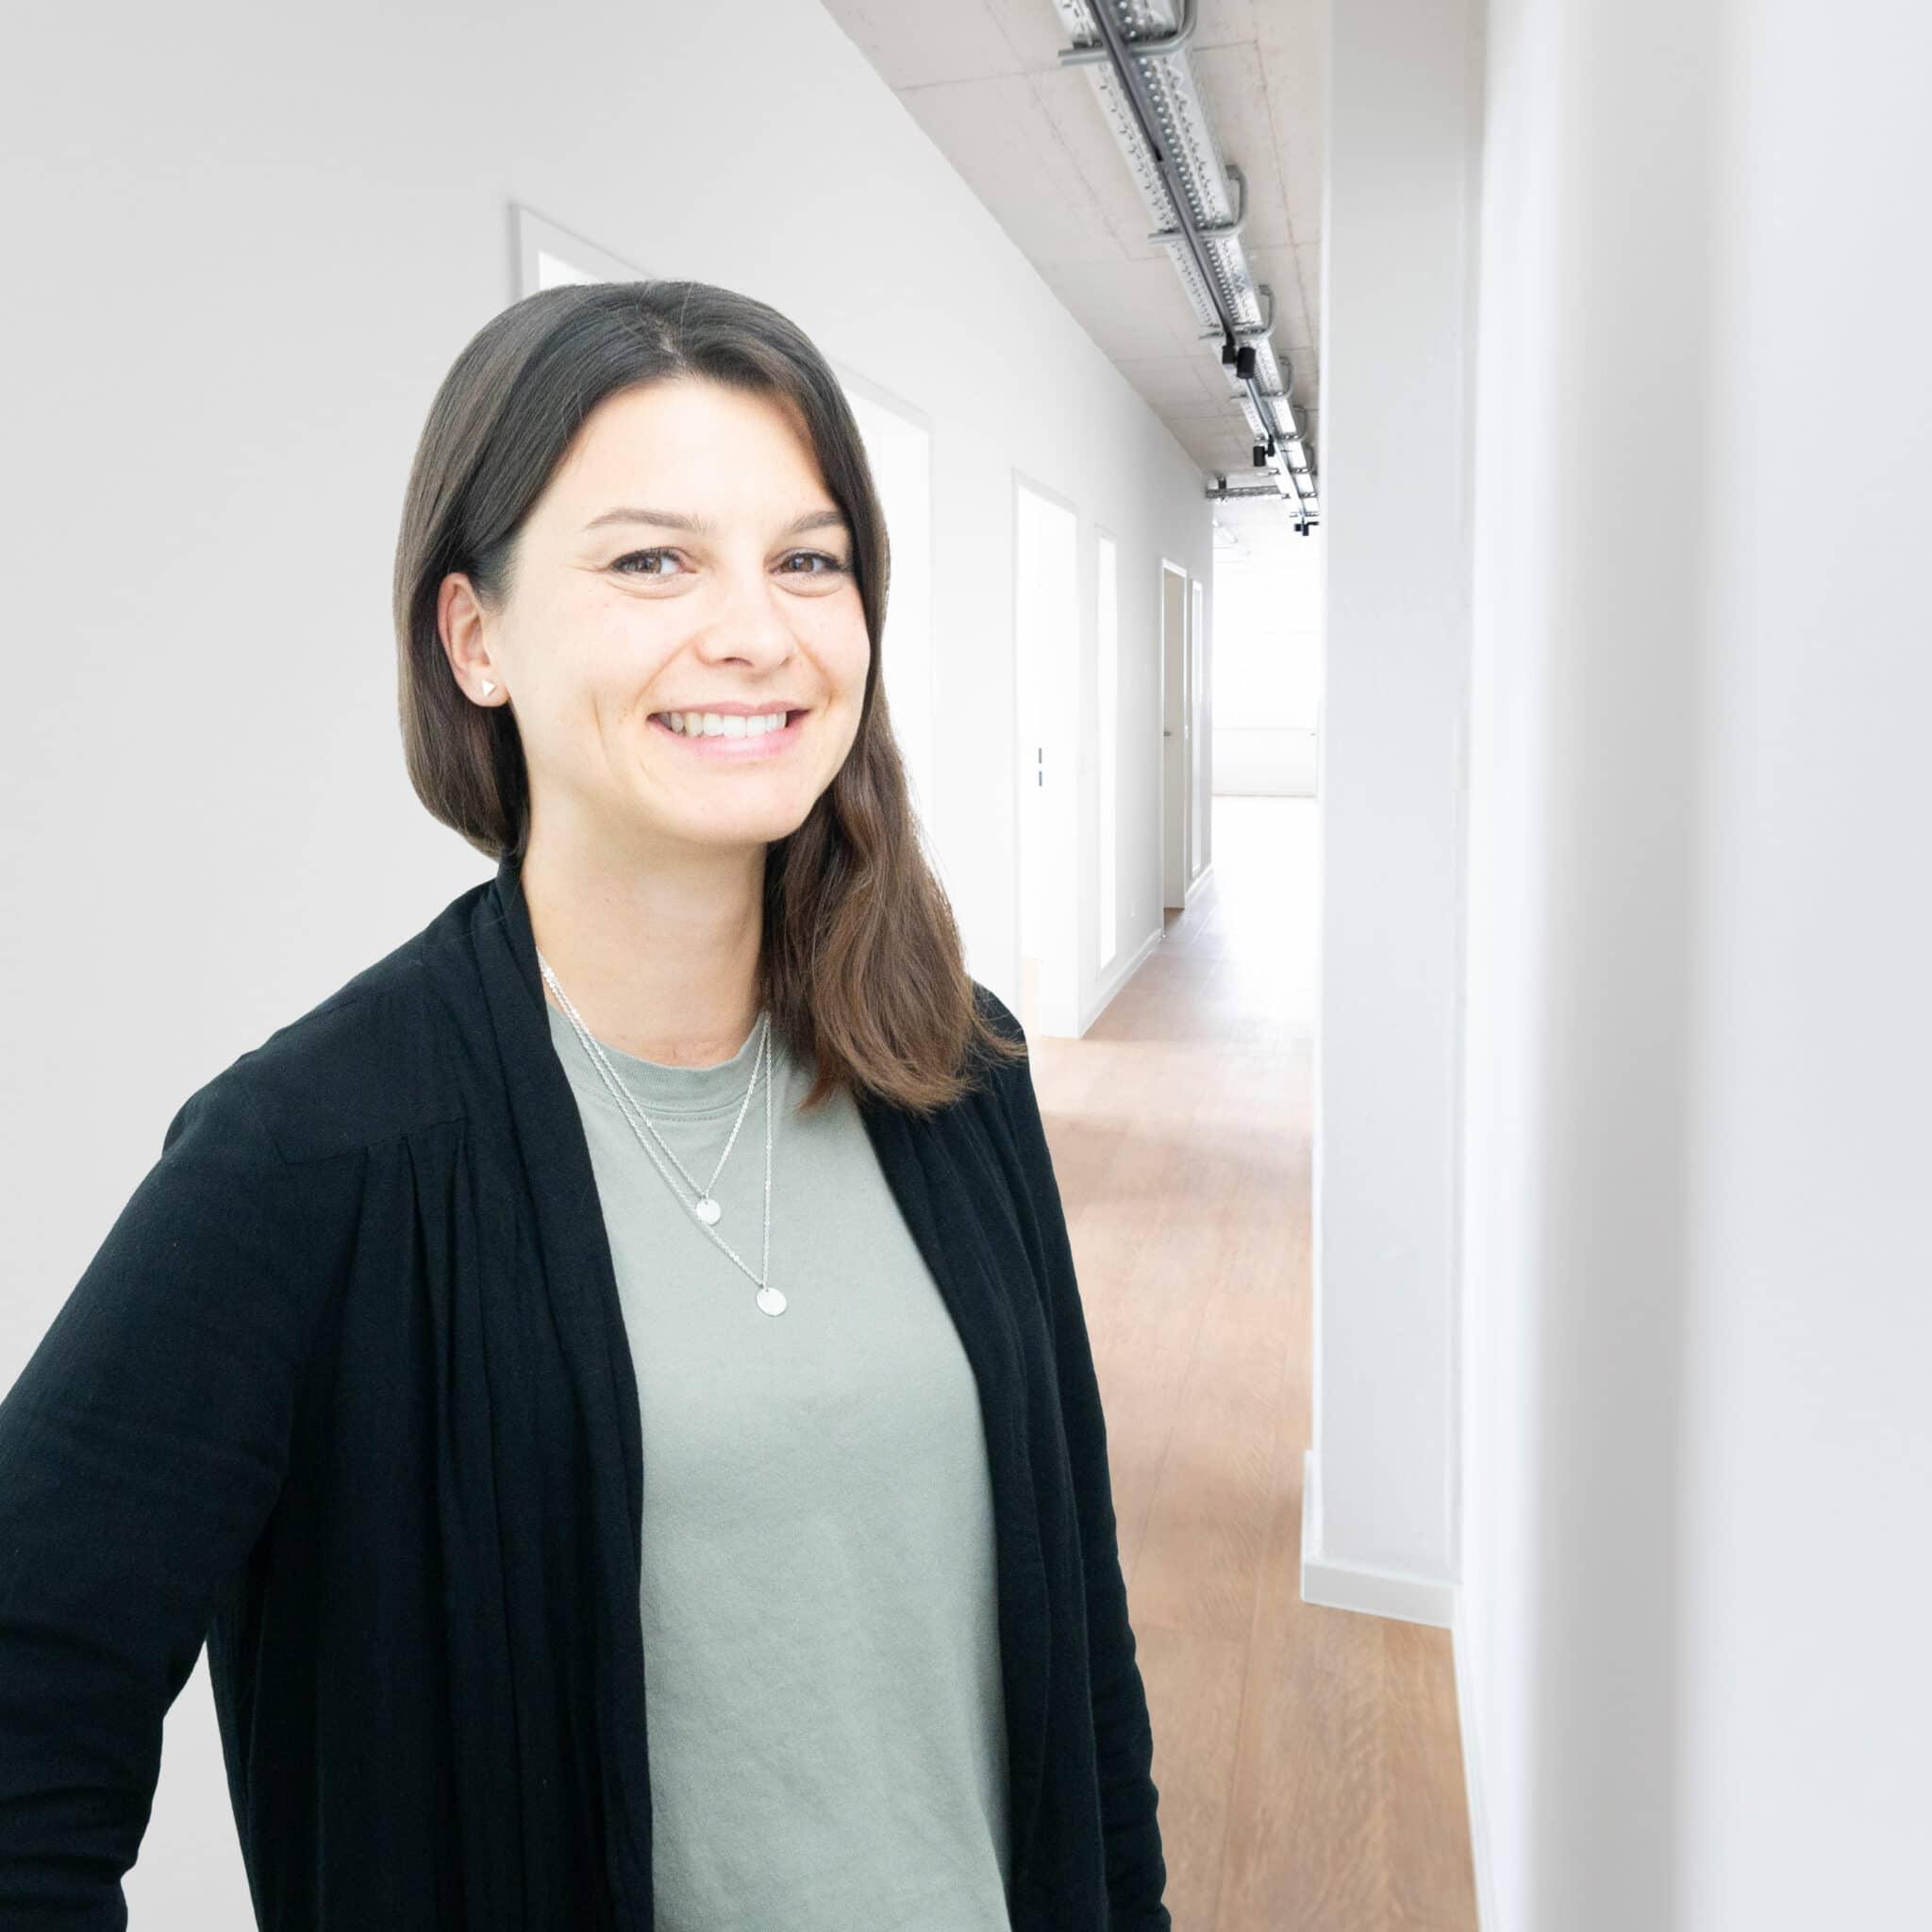 Profilbild Sonja Hage